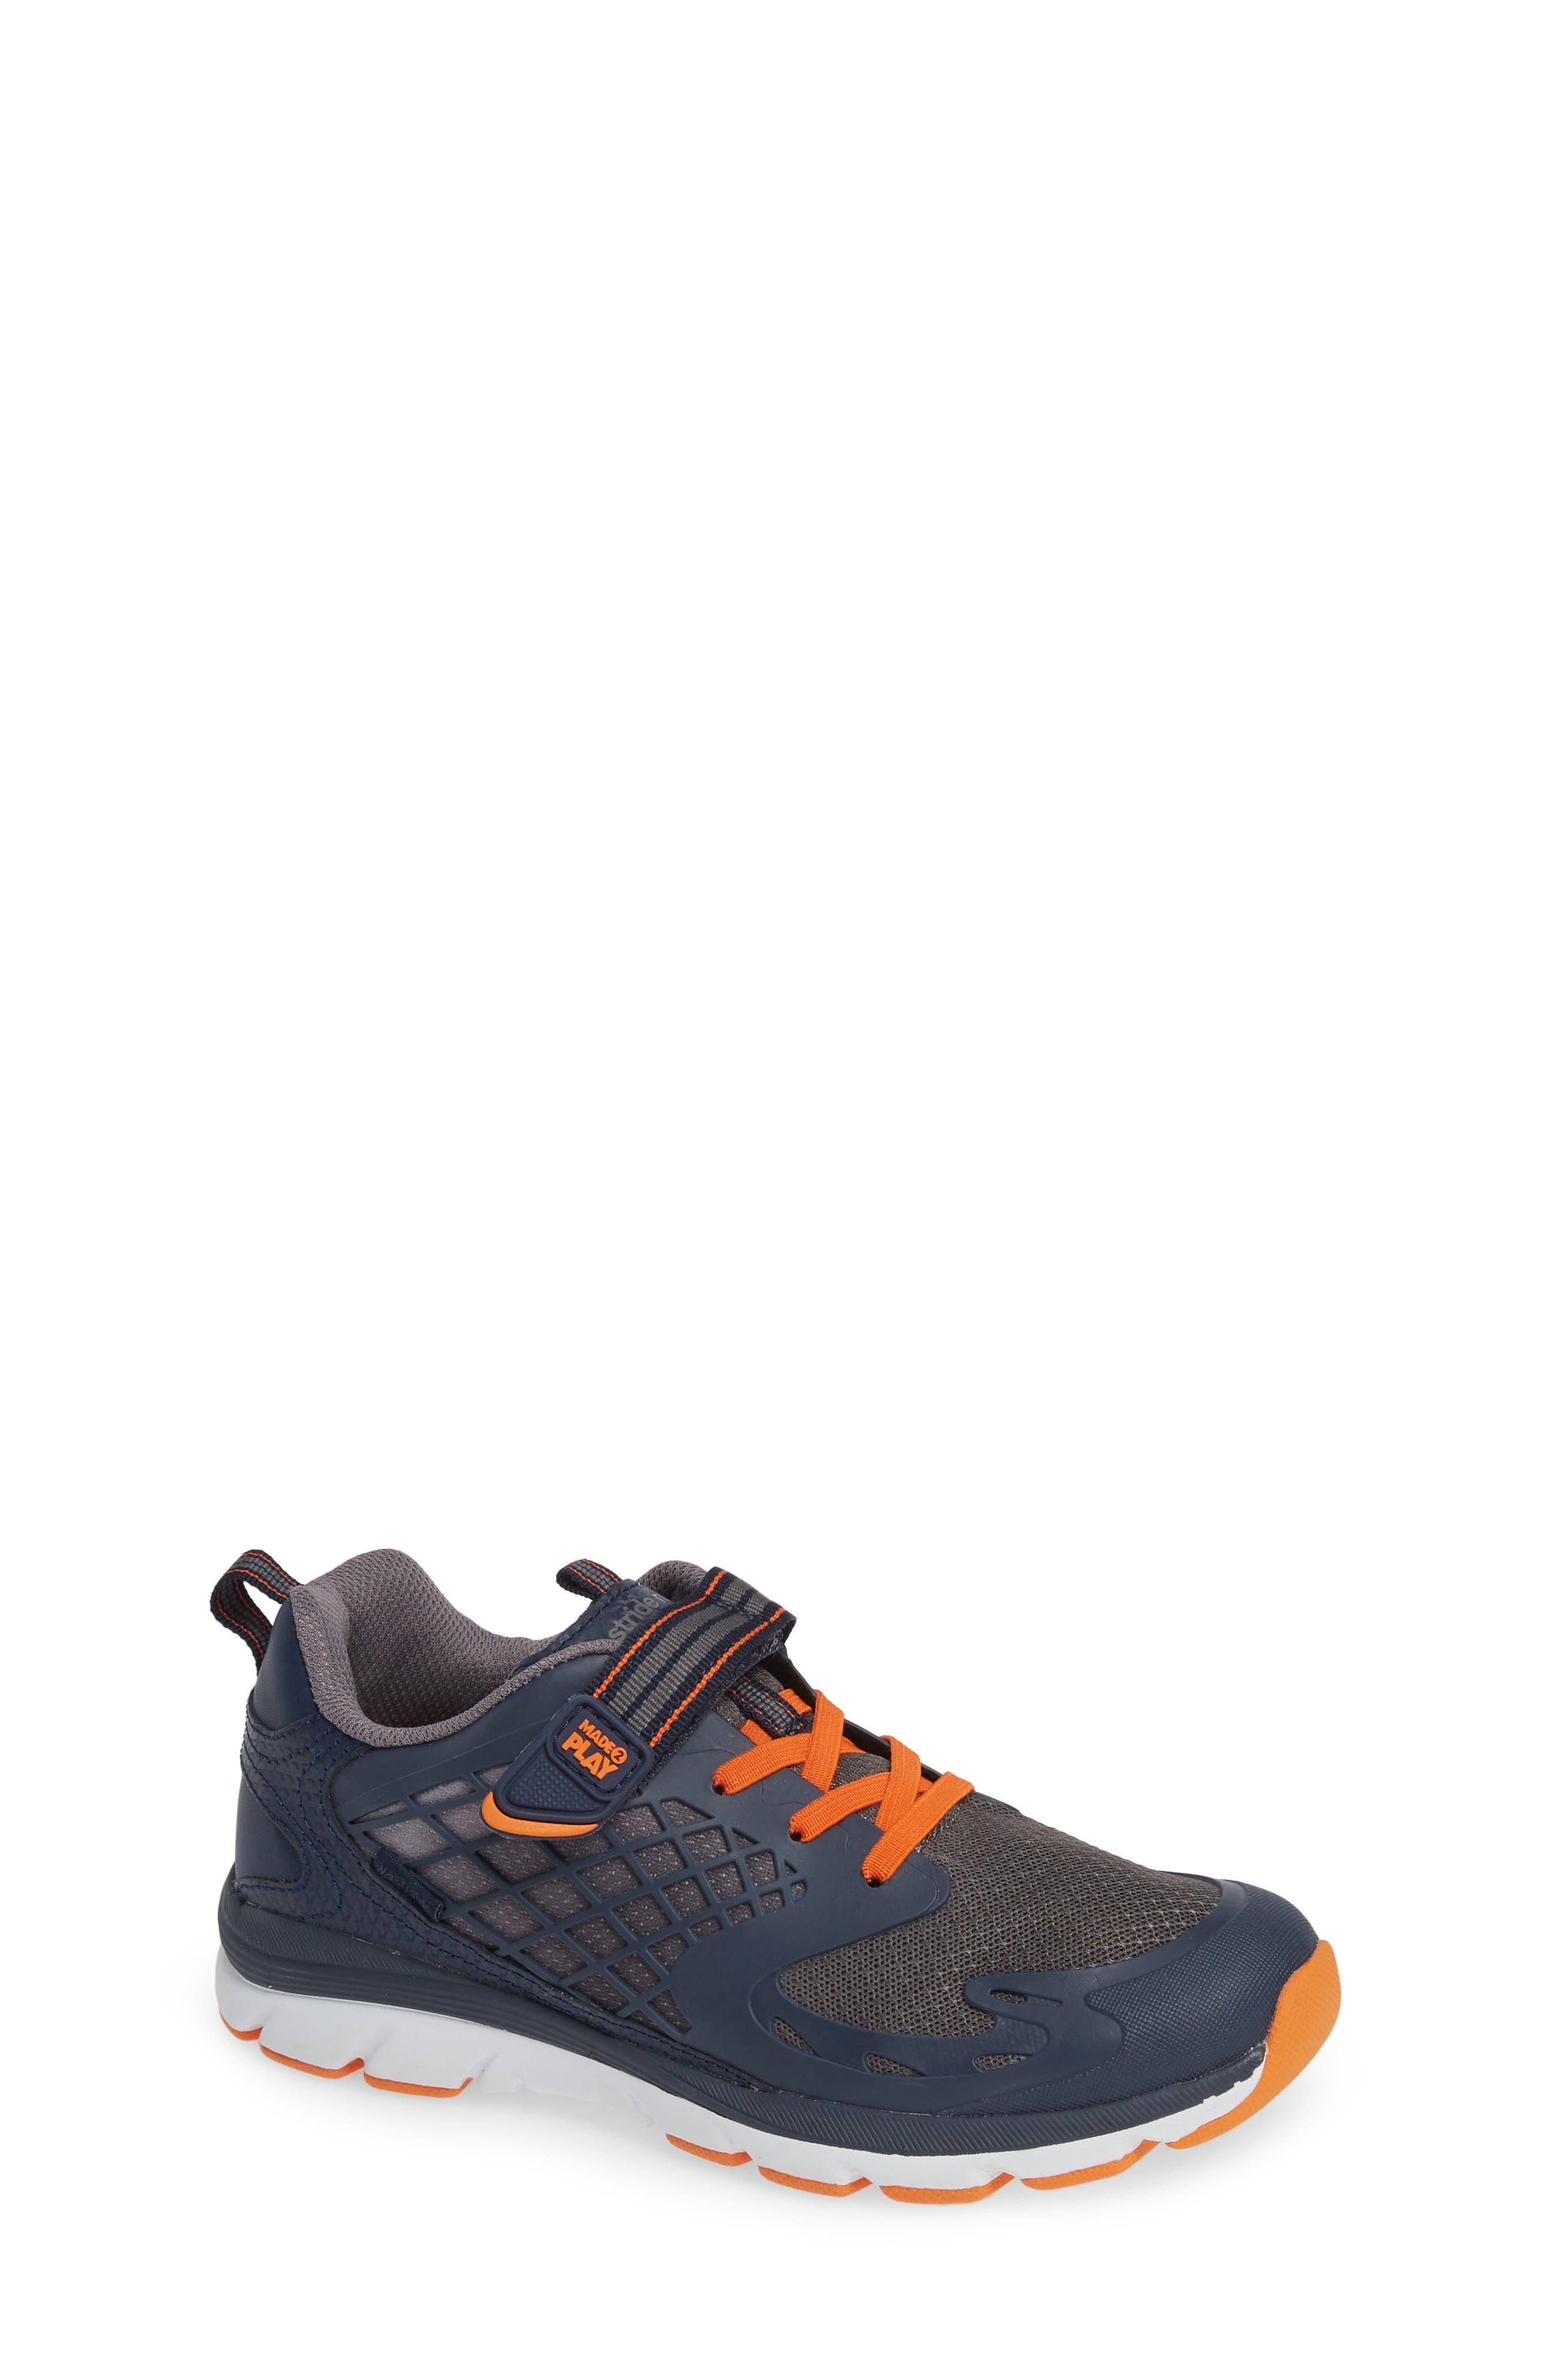 Made 2 Play Breccen Sneaker,                             Main thumbnail 1, color,                             NAVY/ ORANGE